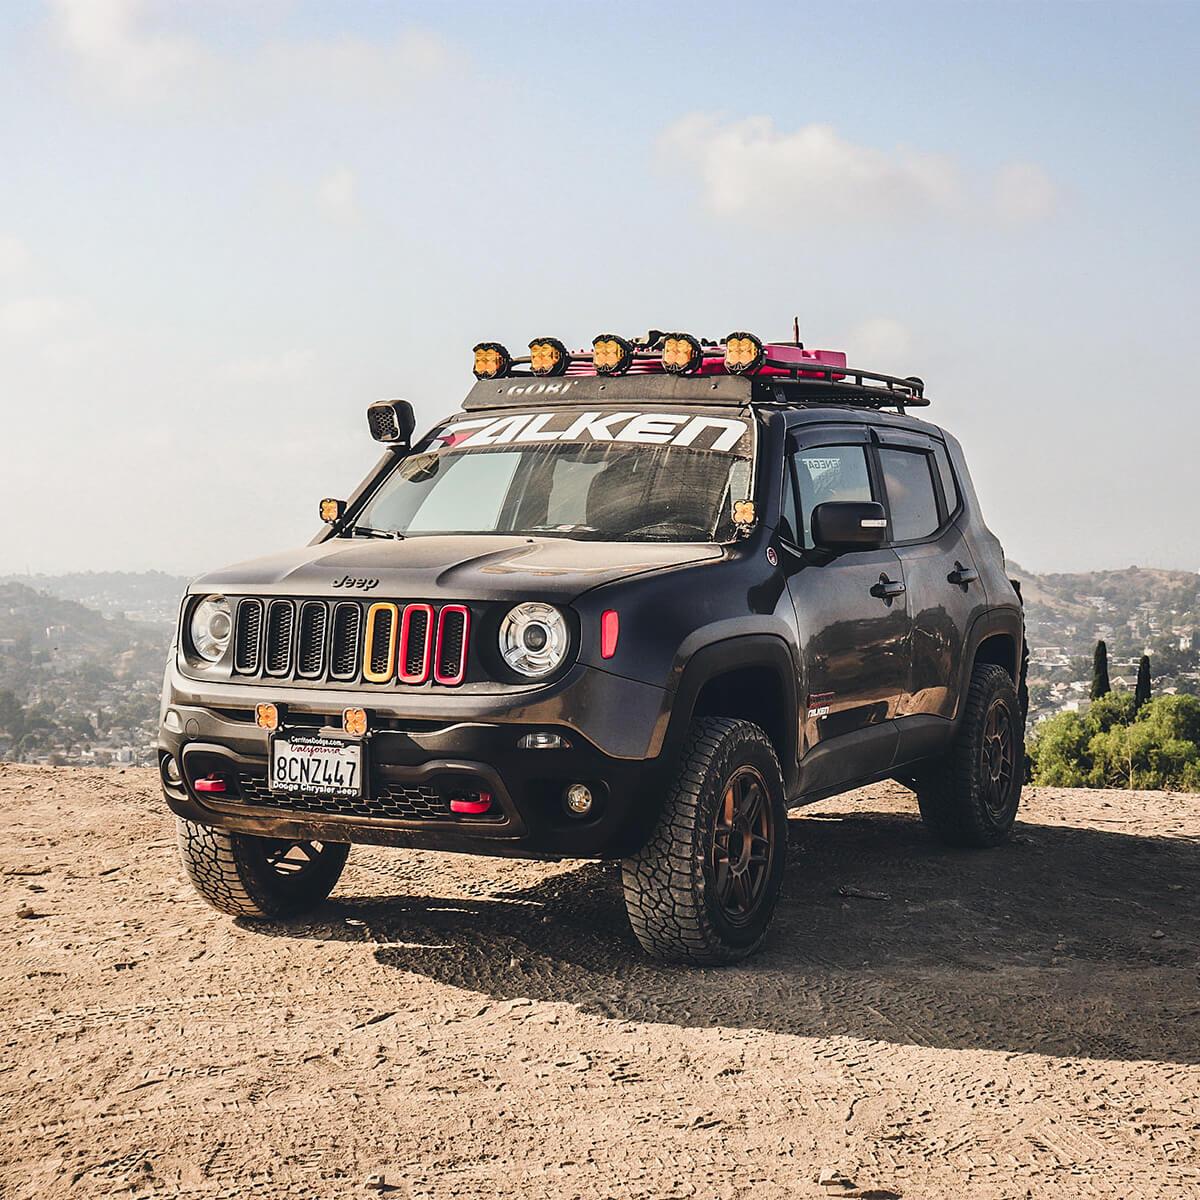 Jeep Renegade Gobi roof rack